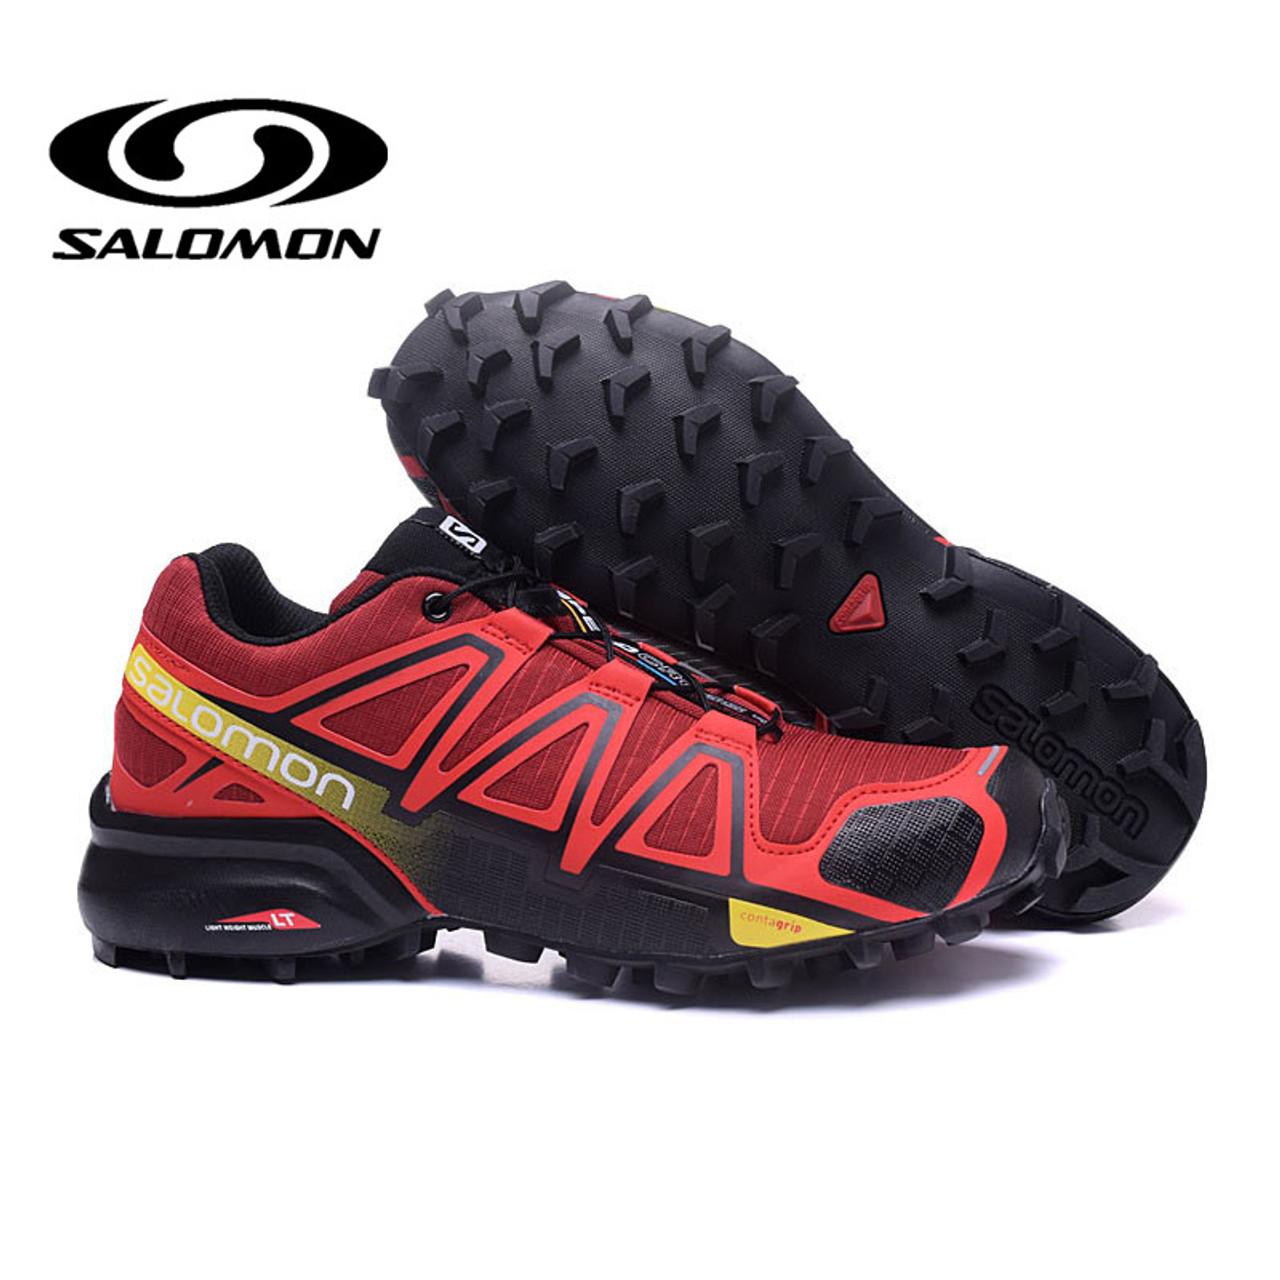 2019 New arrivel Salomon Shoes Men Speed Cross 4 CS Cross country Outdoor Shoes SPEEDCROSS 4 Eur40 46 Elastic Band Trekking Shoe